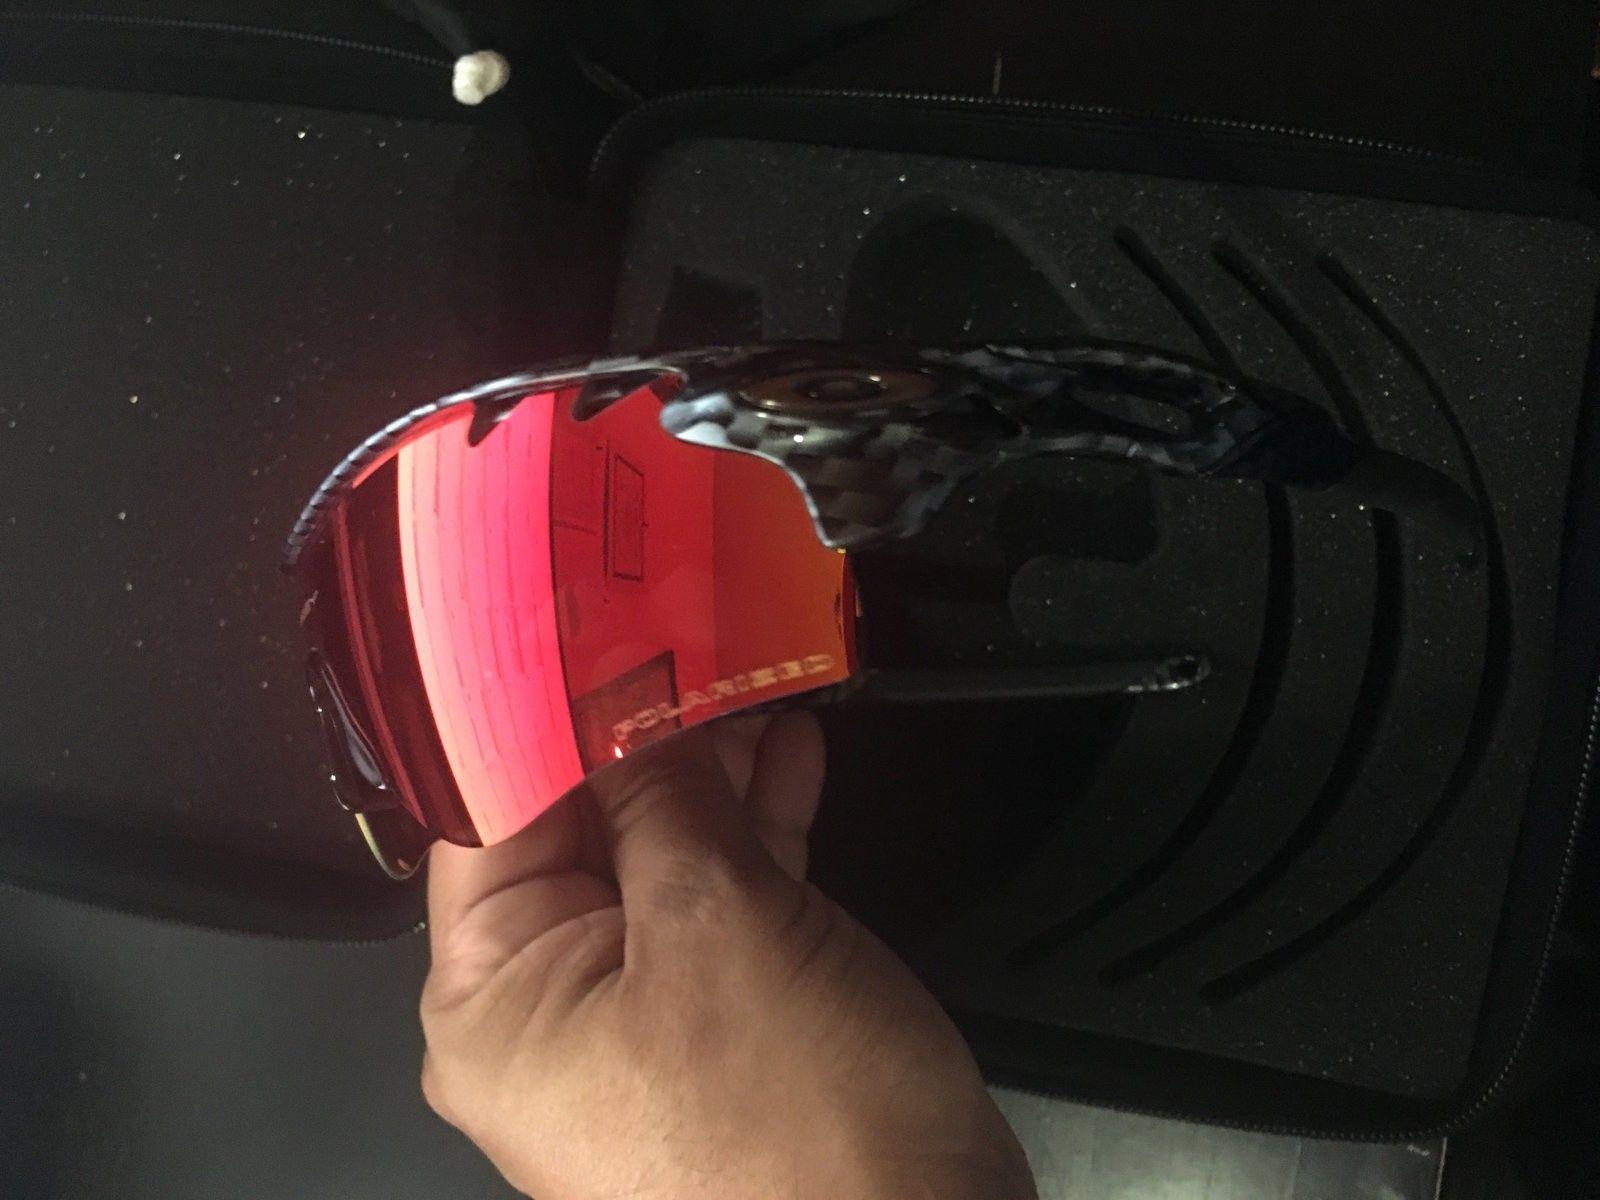 RadarLock - Carbon Fiber & 00 Red Polarized - 2016-08-28 18.56.30.jpg